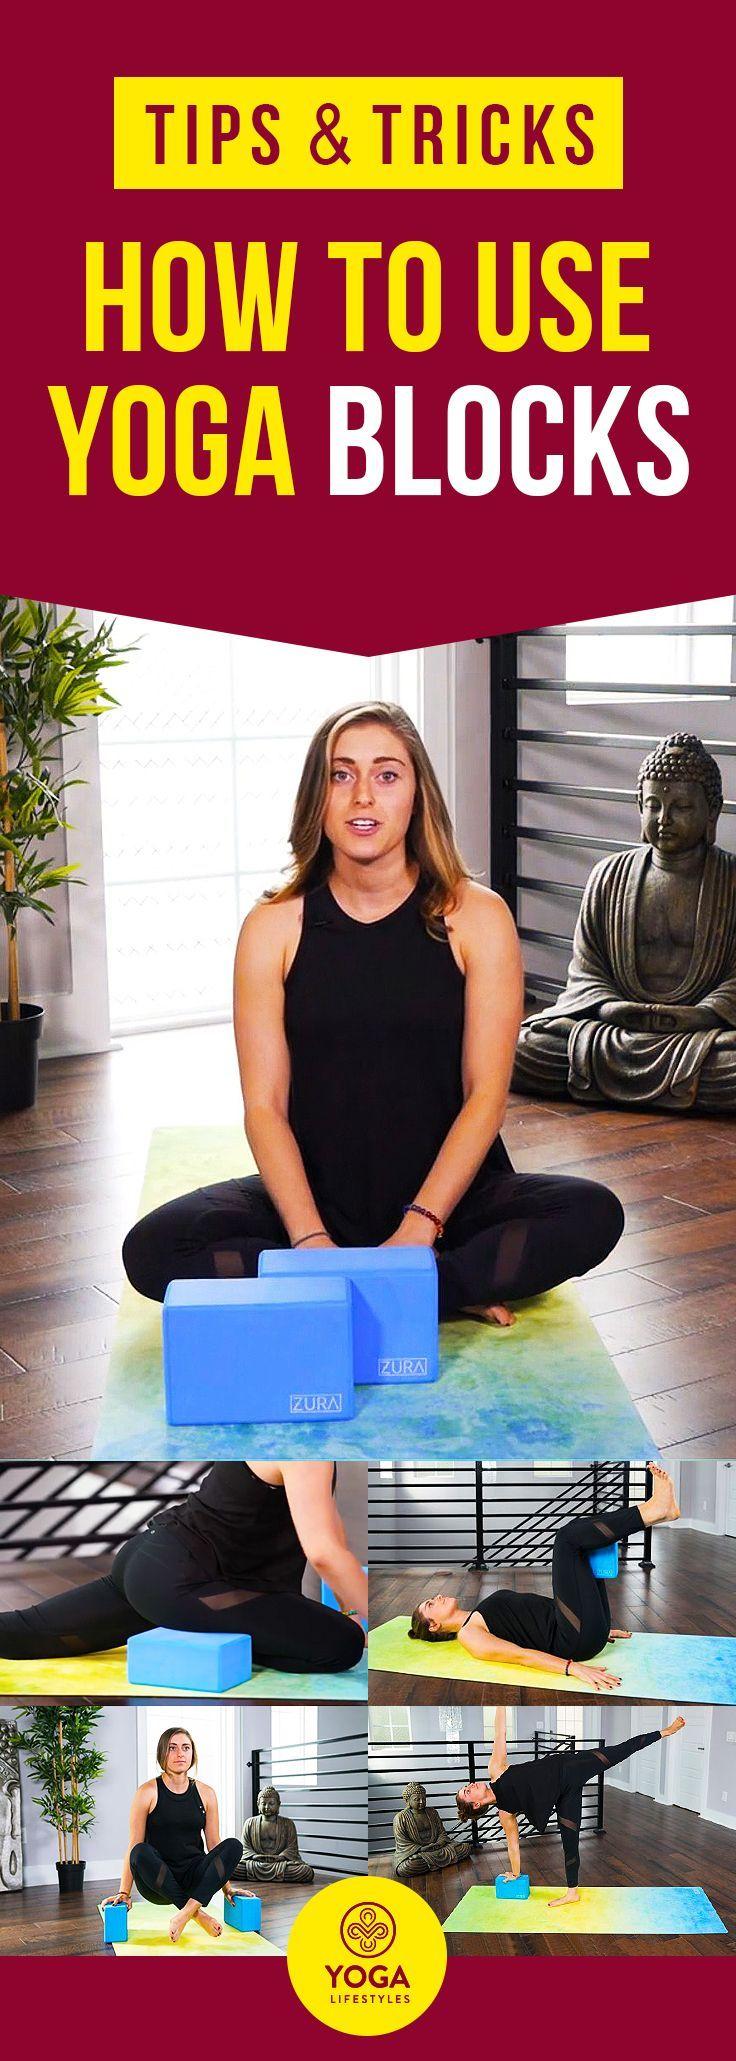 Tips & Ticks: How to use yoga blocks